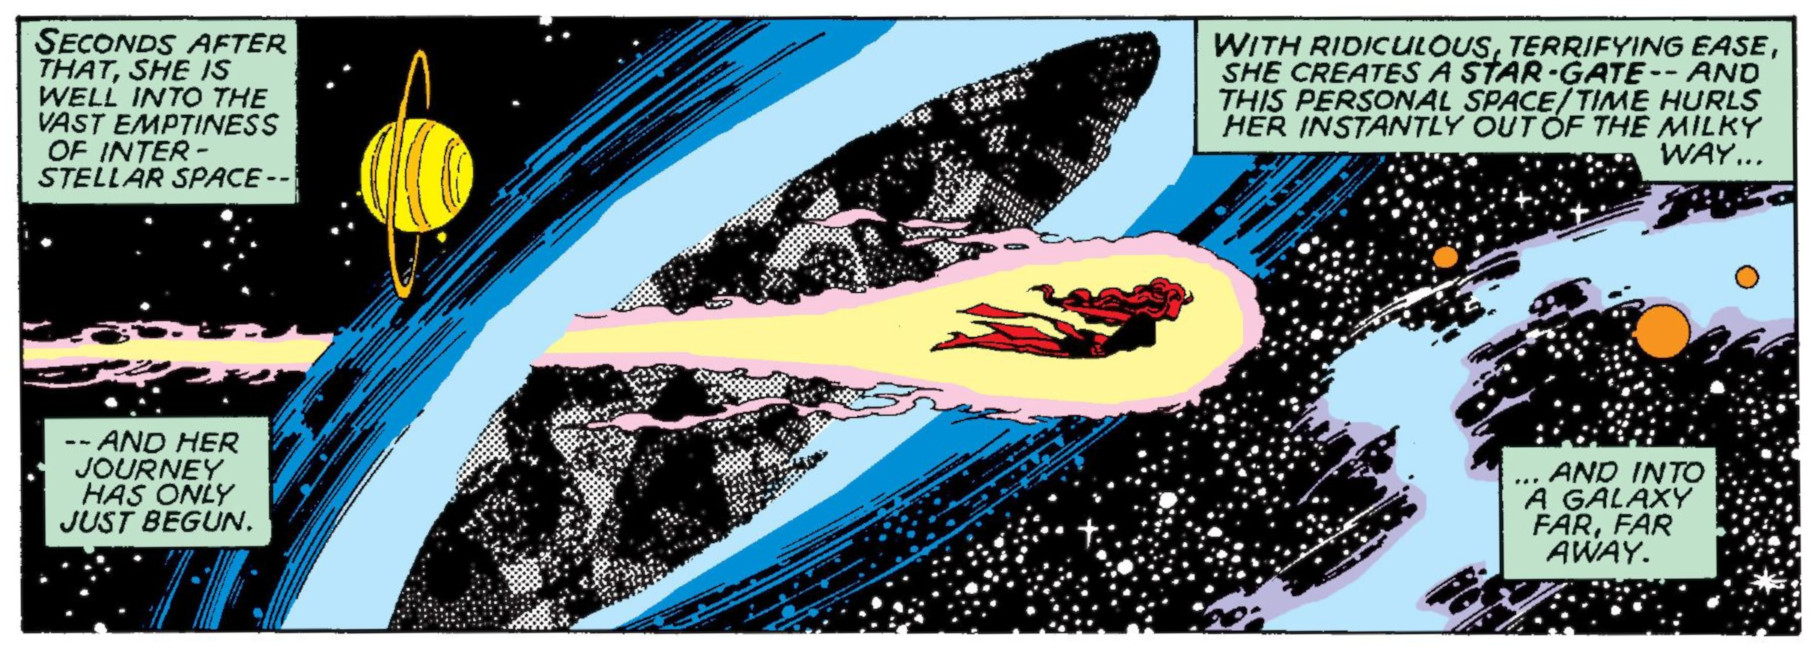 Uncanny X-Men  #135 (Marvel, July 1980), page 19